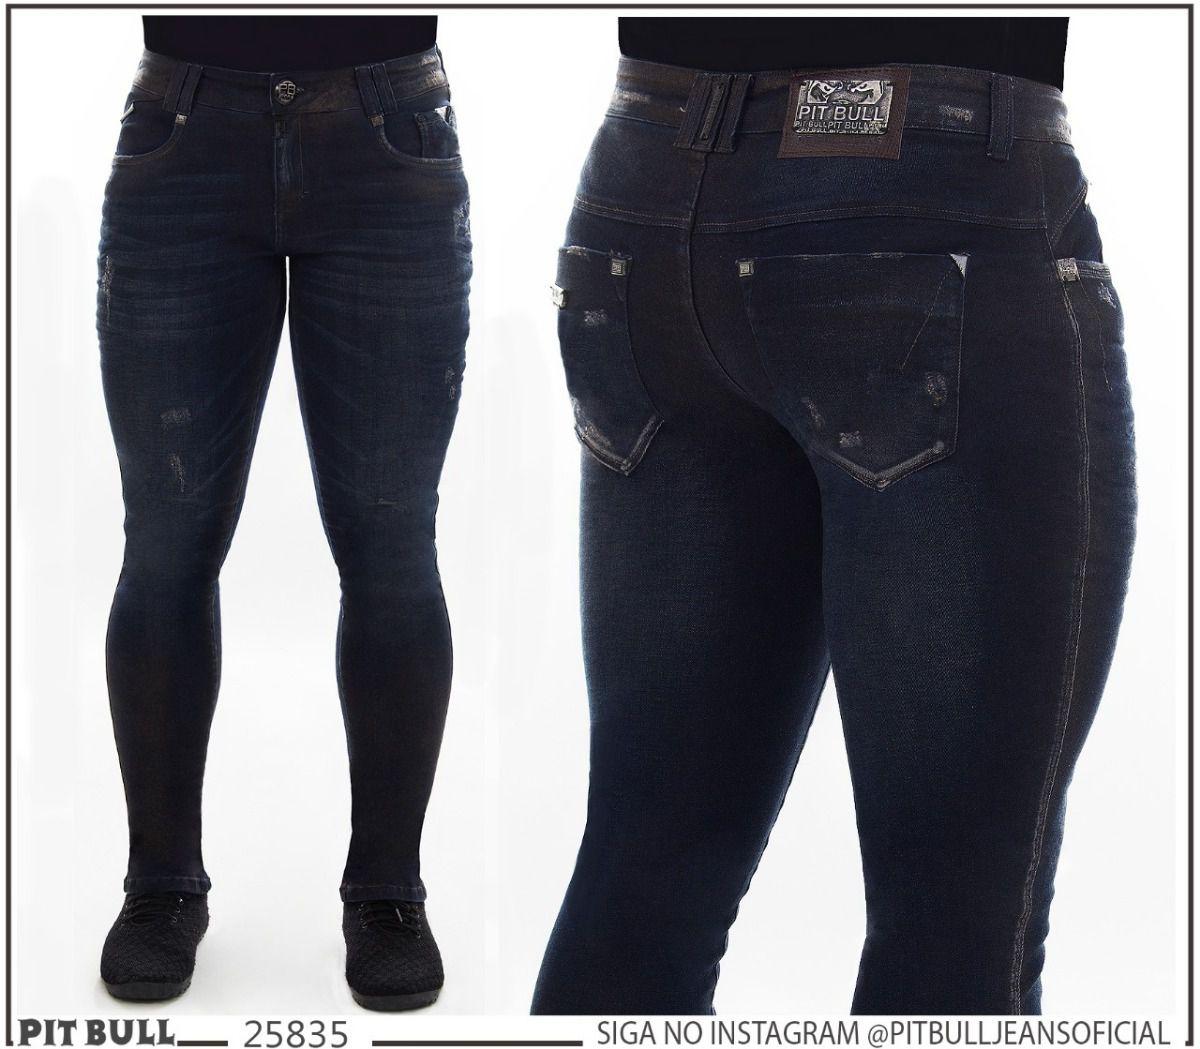 130ba2e98 Calca masculina super slim Pit Bull Jeans Ref. 25835